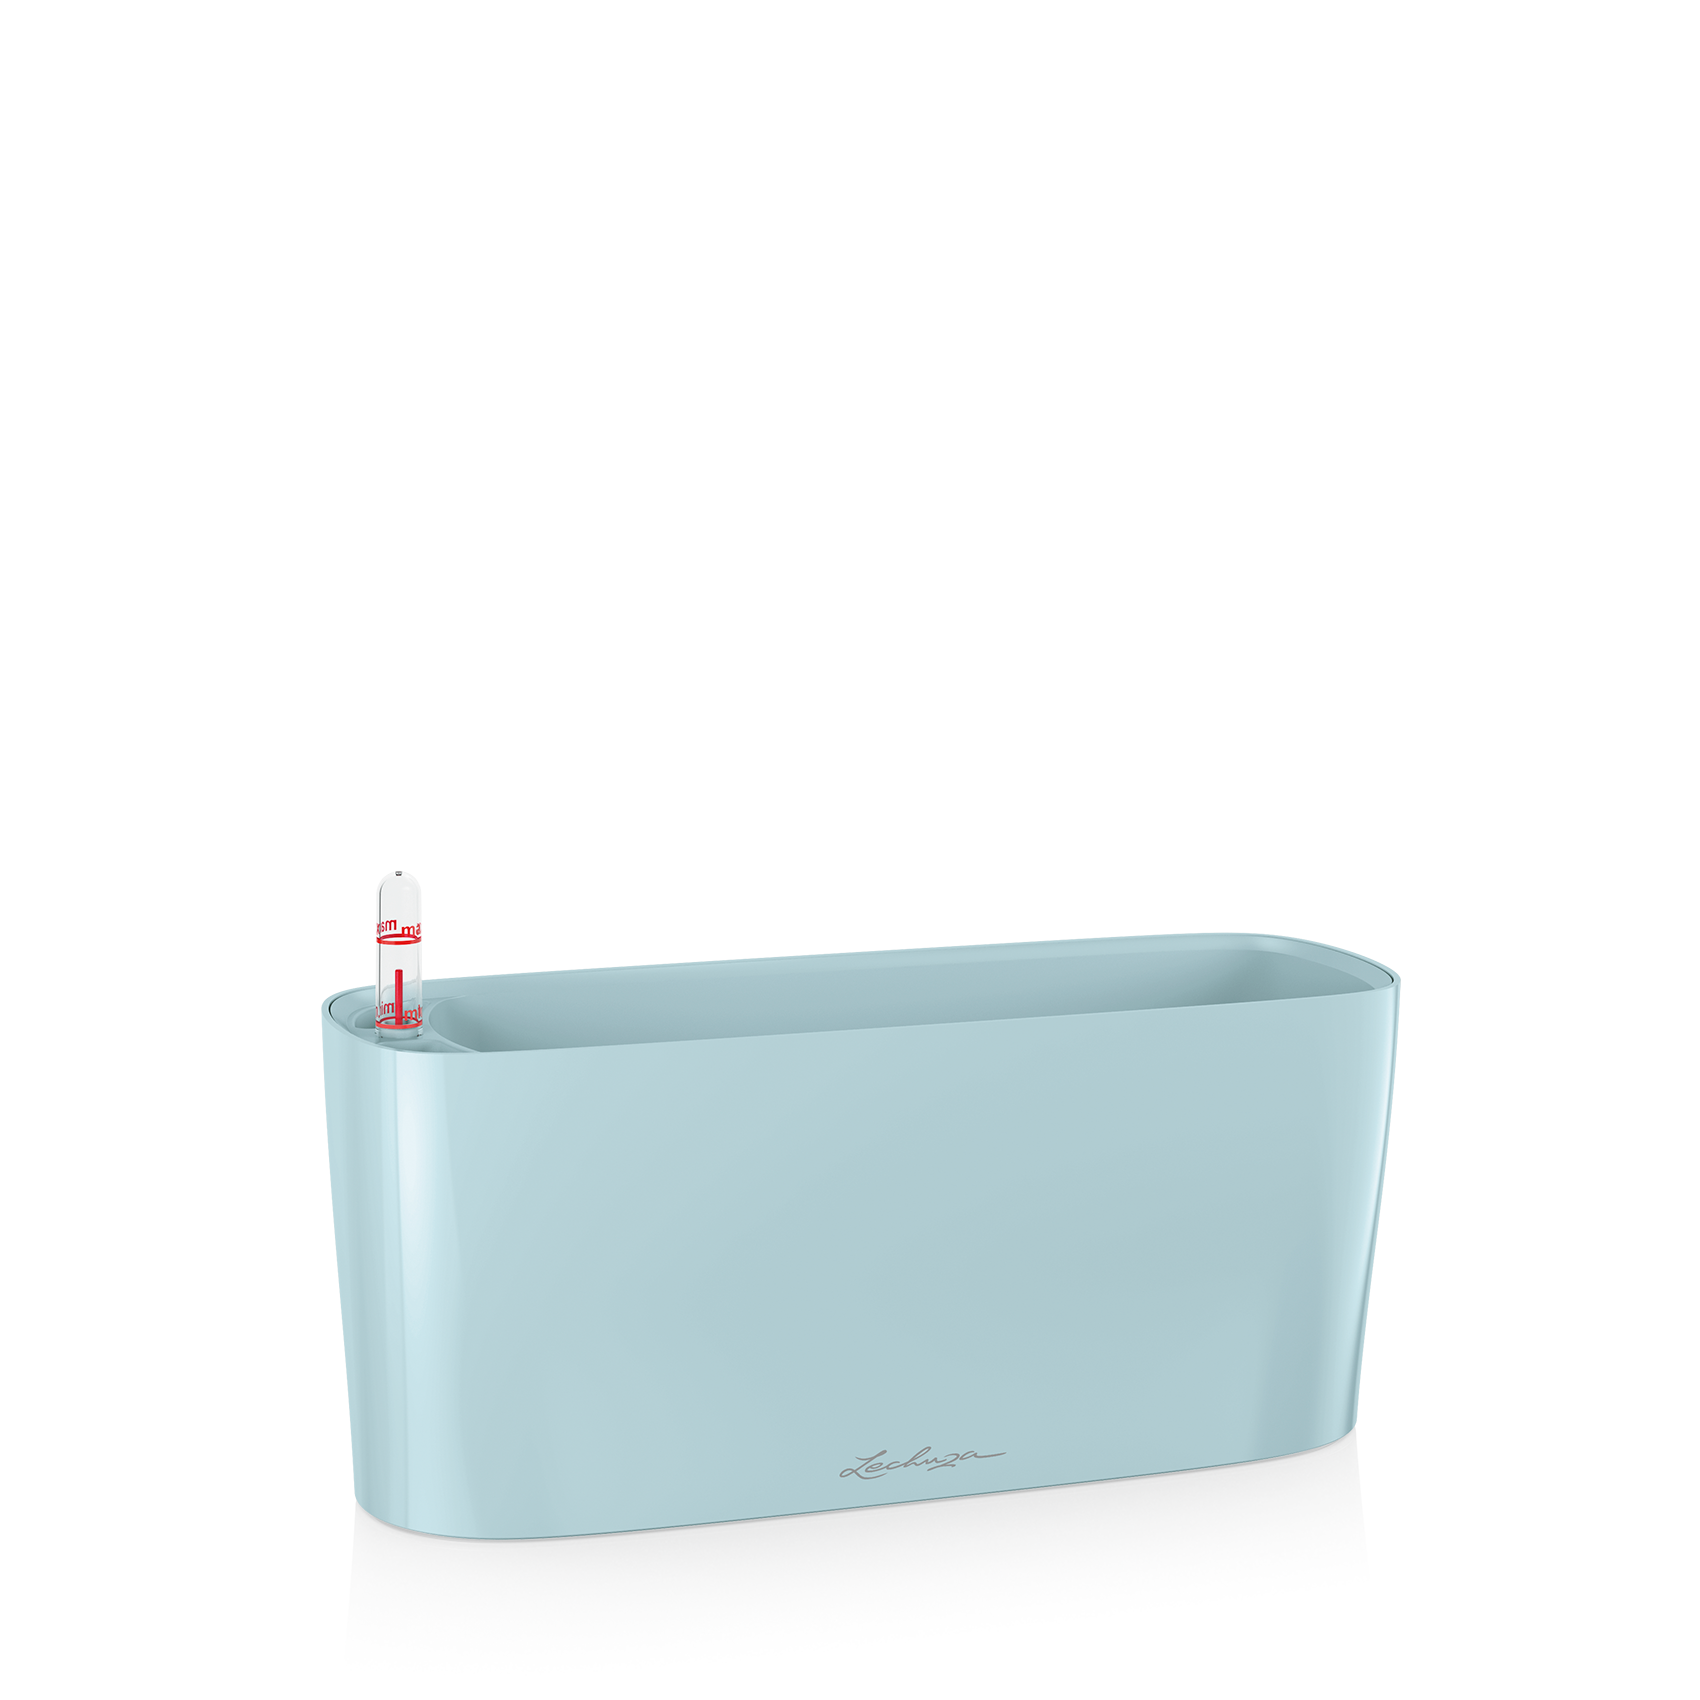 DELTA 10 skandinavisch blau hochglanz